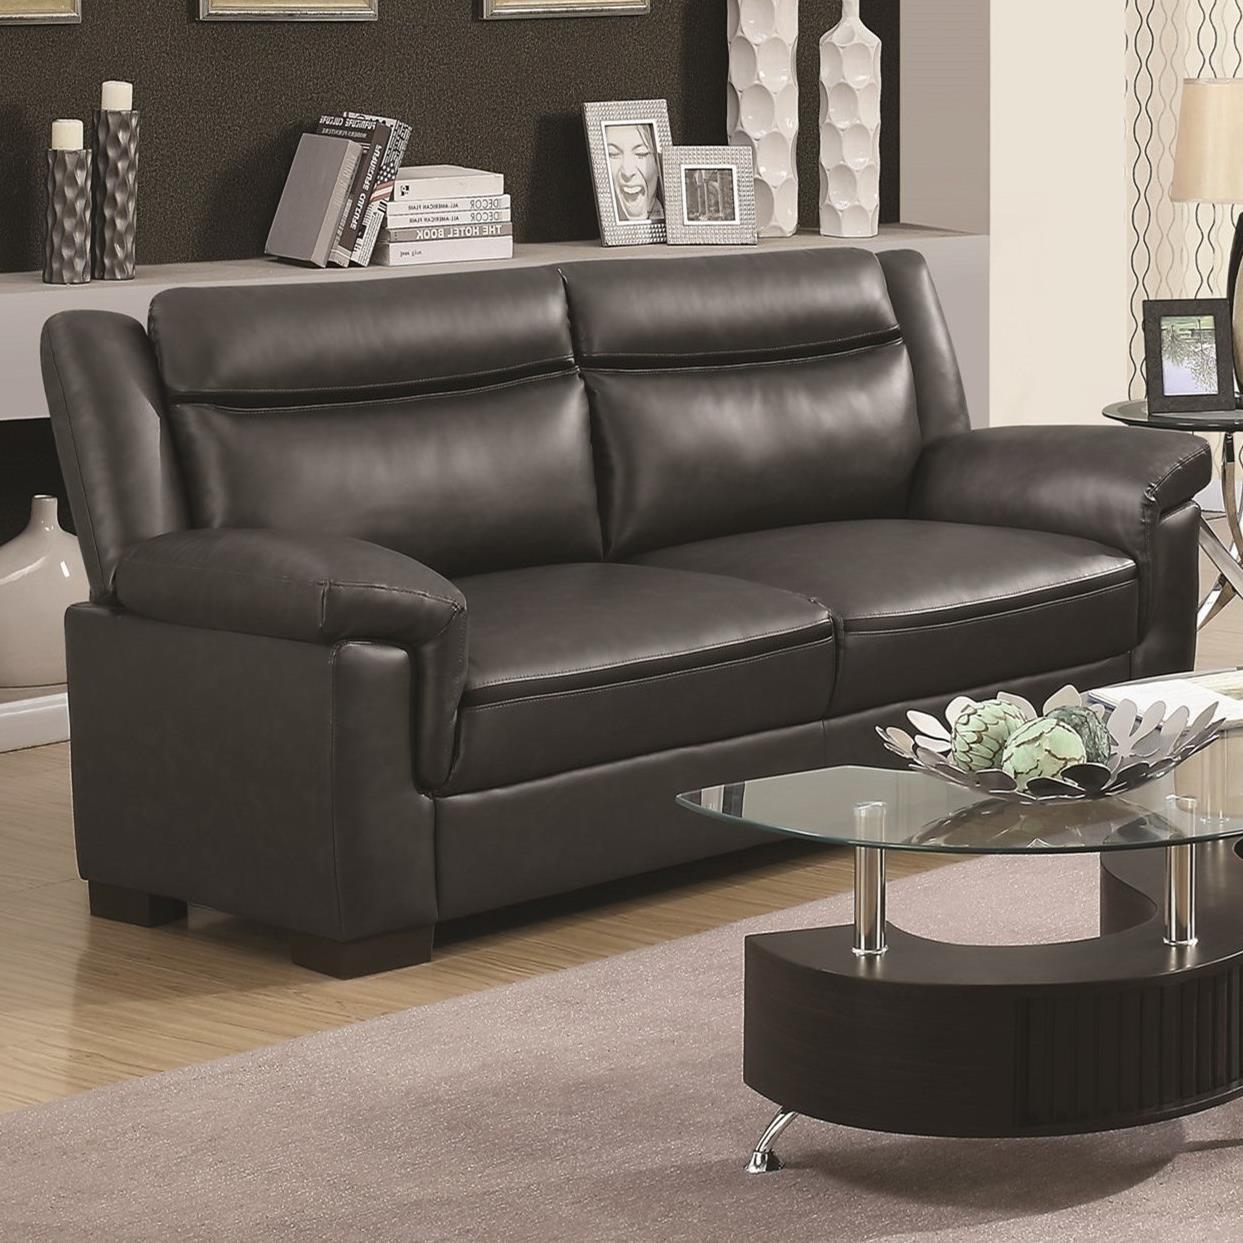 Coaster Arabella Contemporary Leatherette Sofa Value City